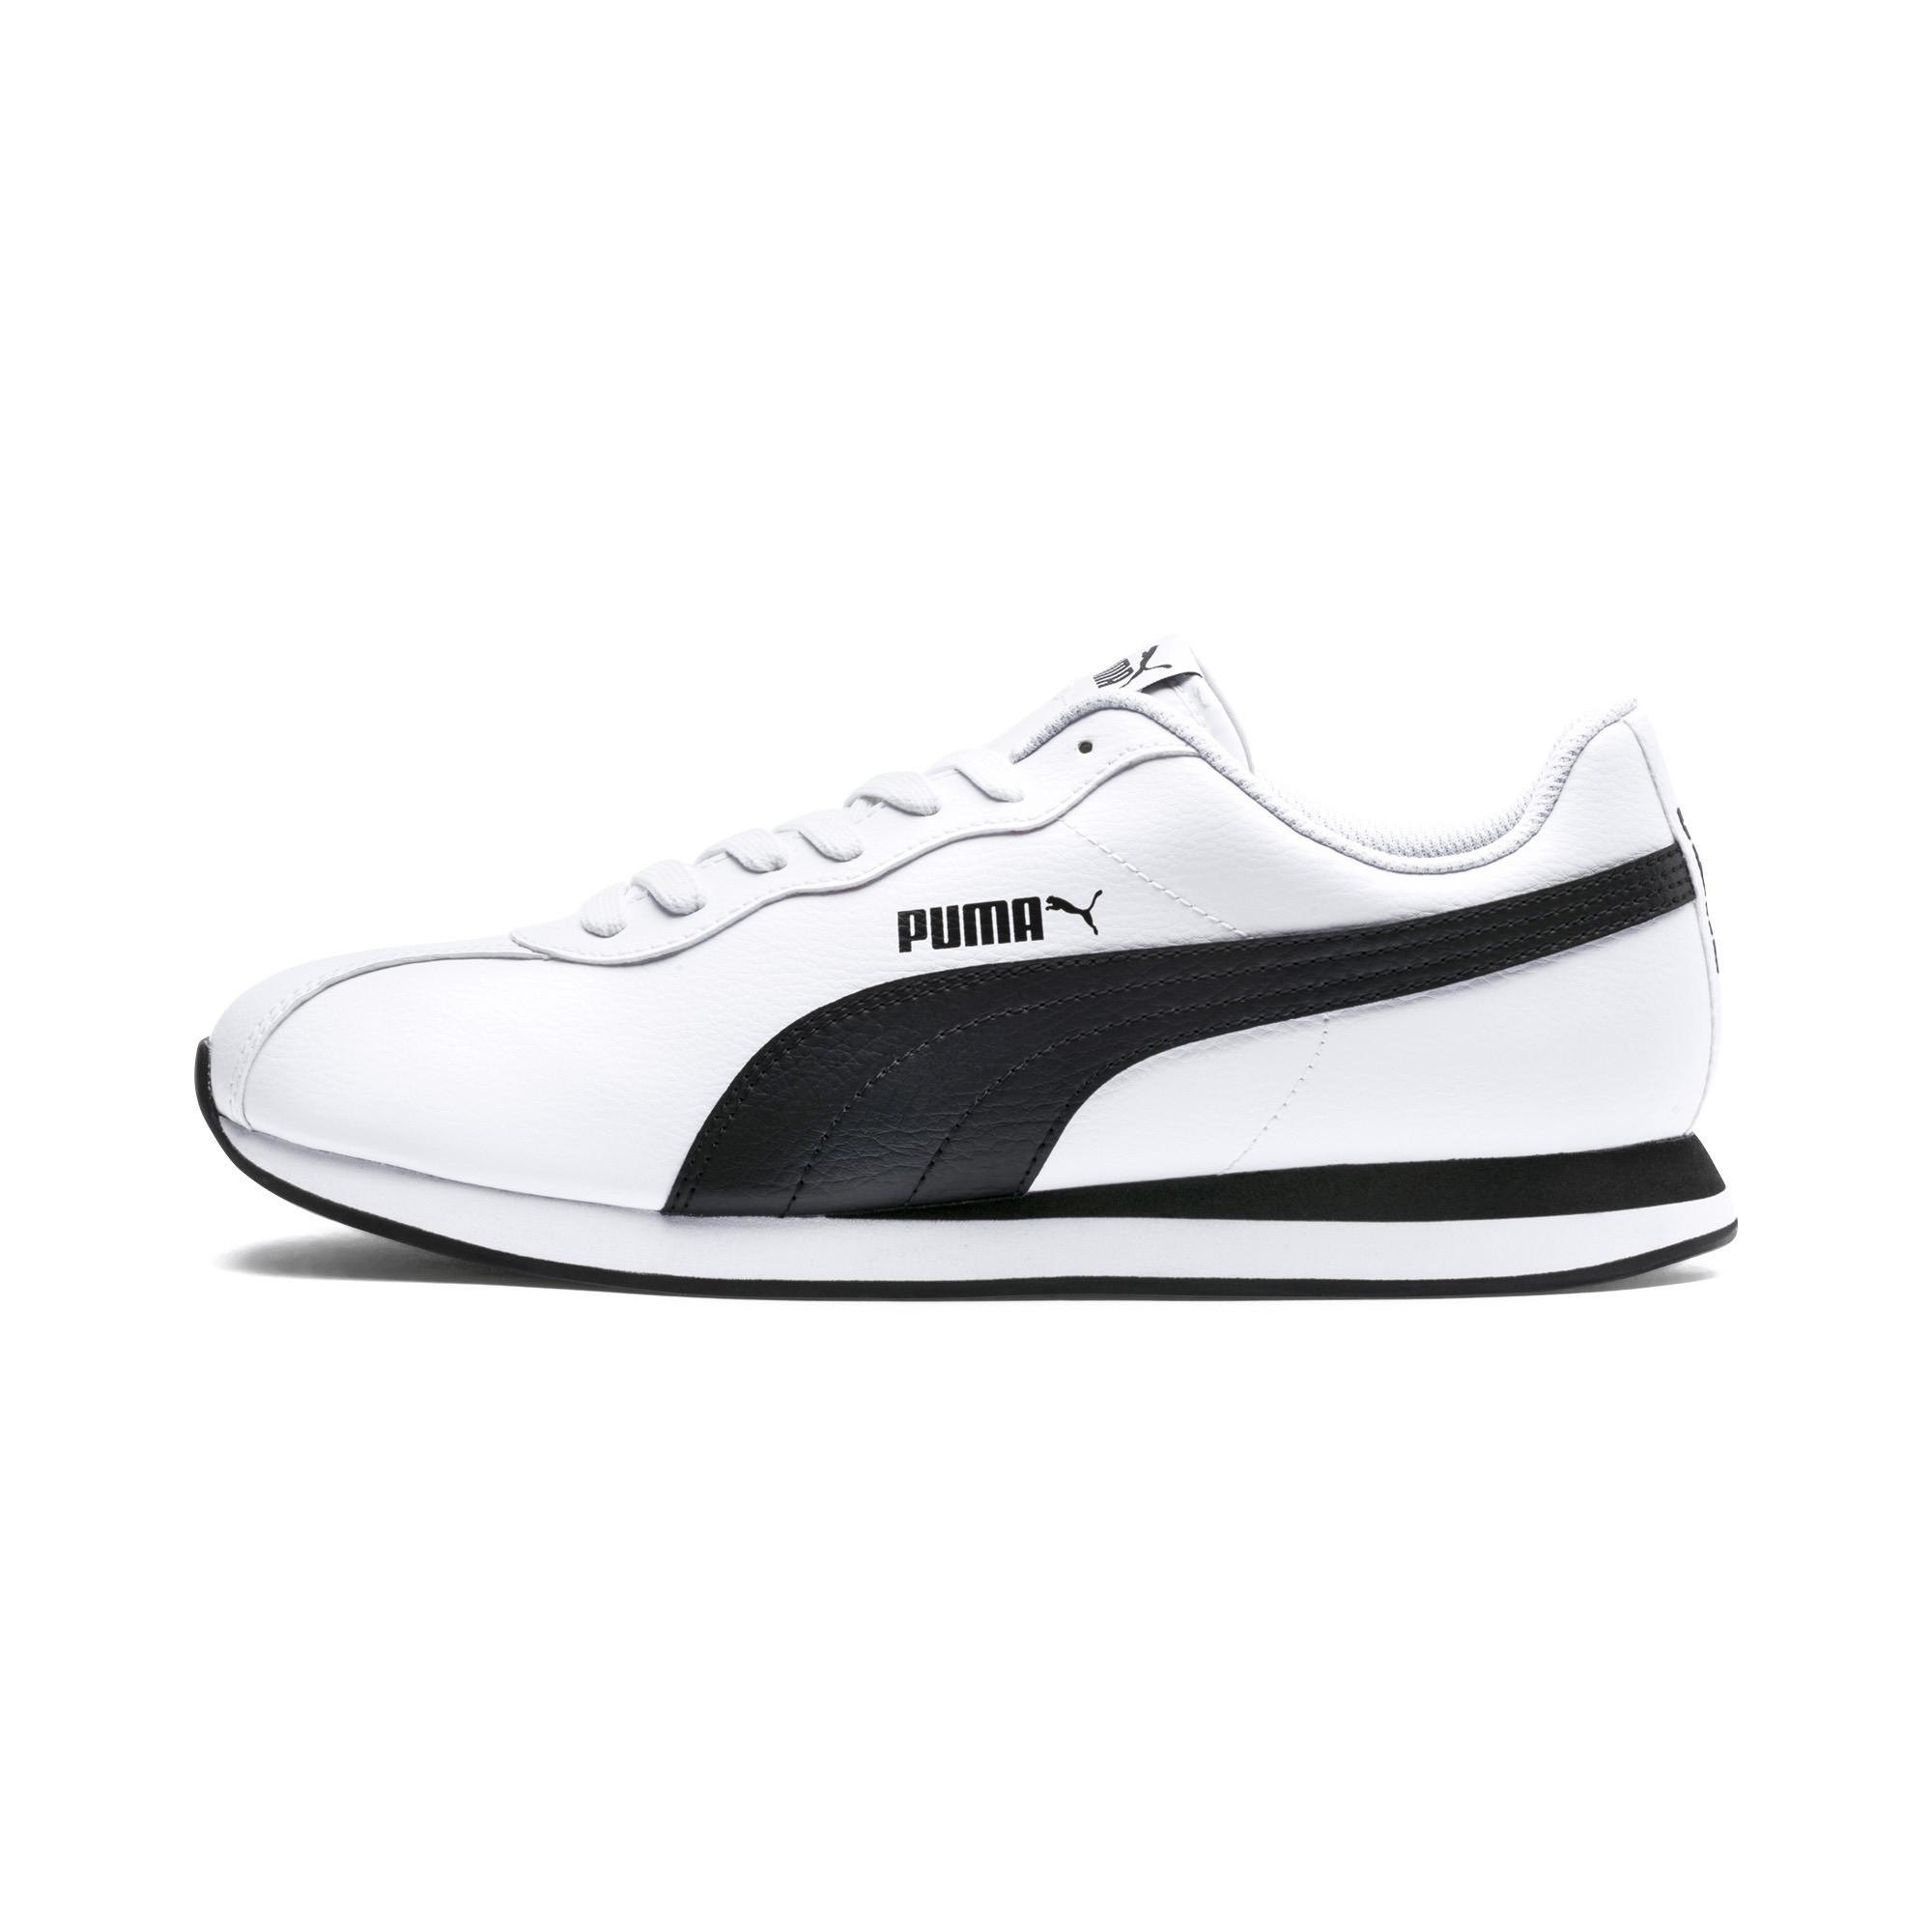 thumbnail 12 - PUMA Men's Turin II Sneakers